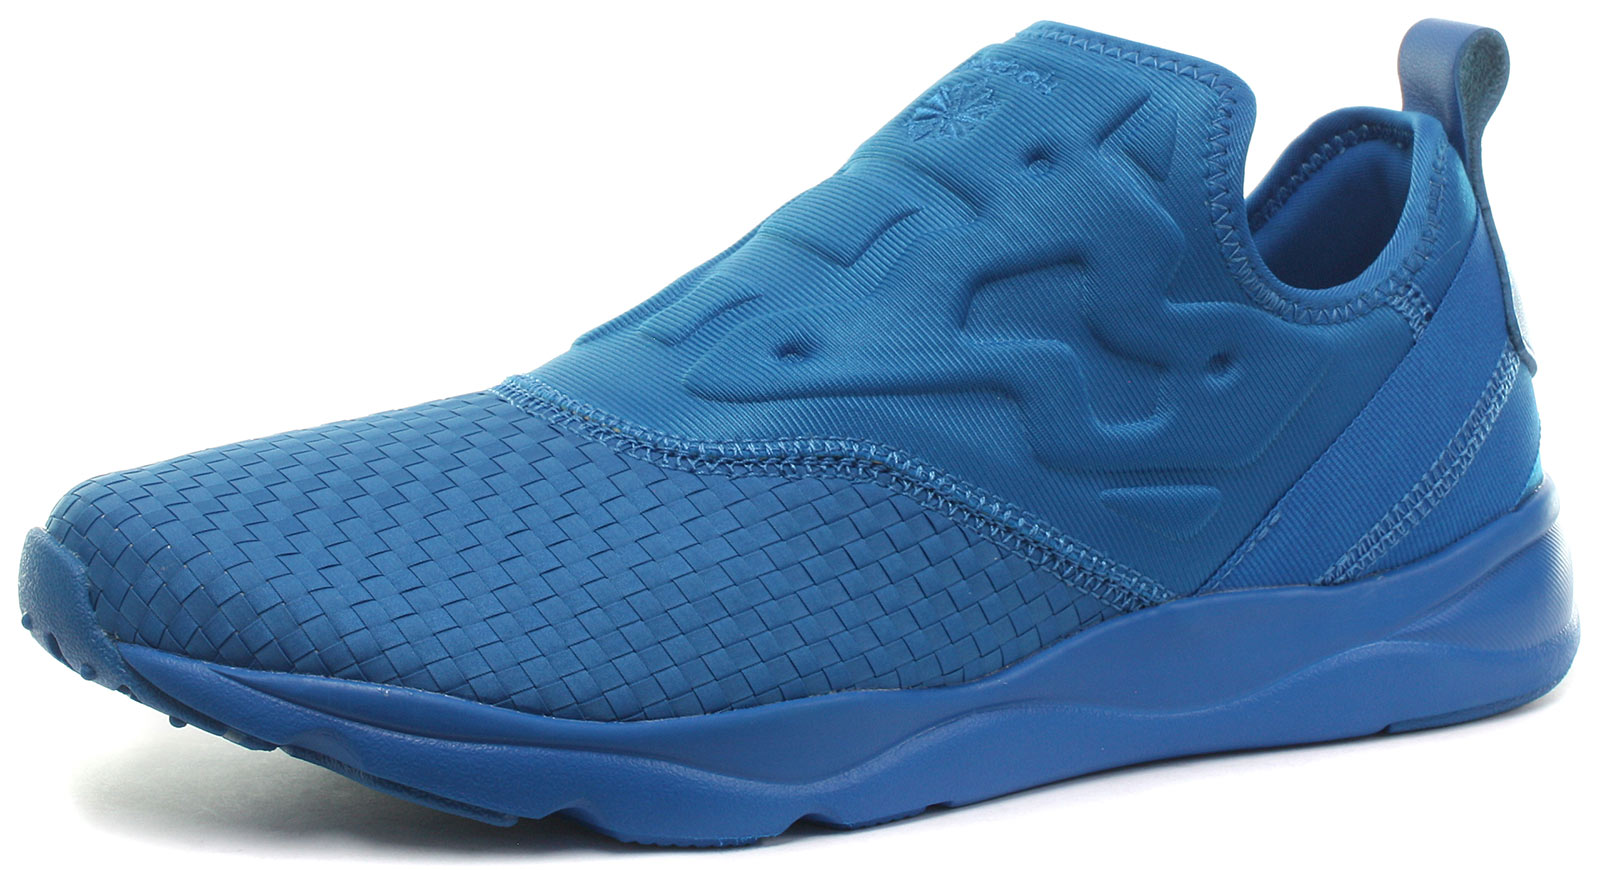 0442b01fcf2 Reebok Furylite Slip-on WW Men Classics Sneaker Men s Shoes Blue ...